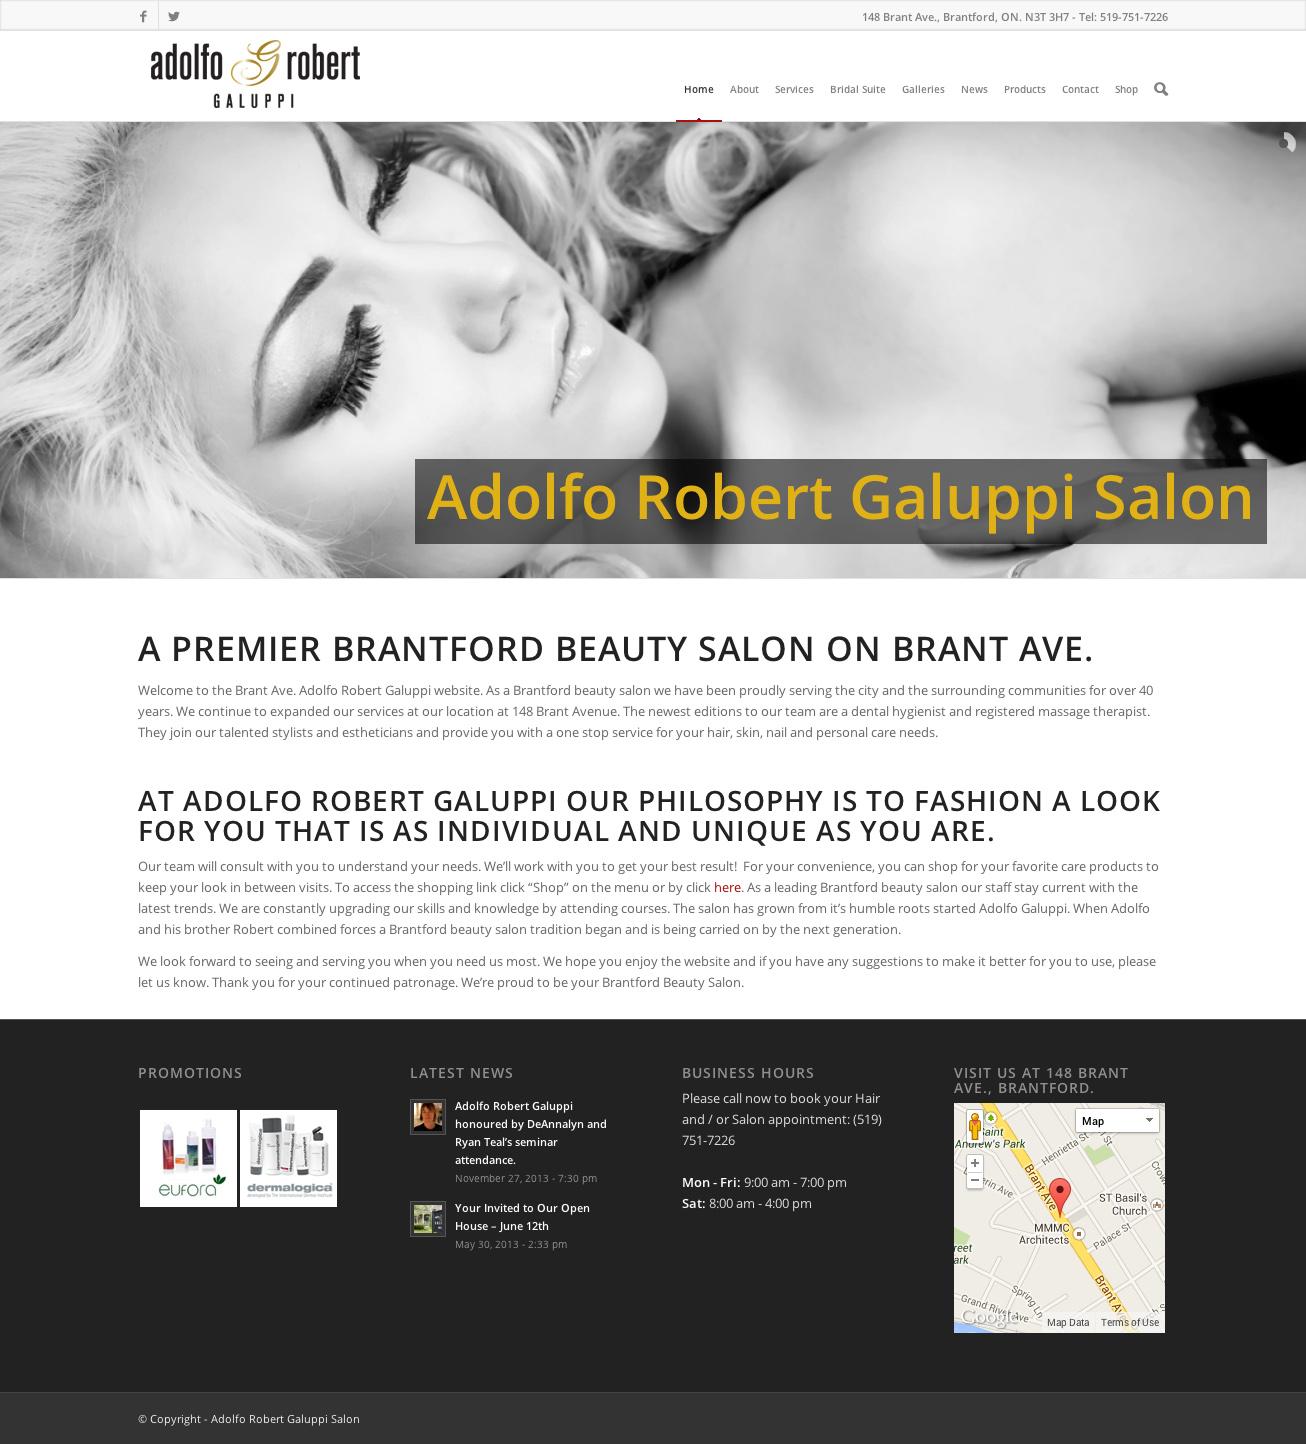 Adolfo Robert Galuppi Salon